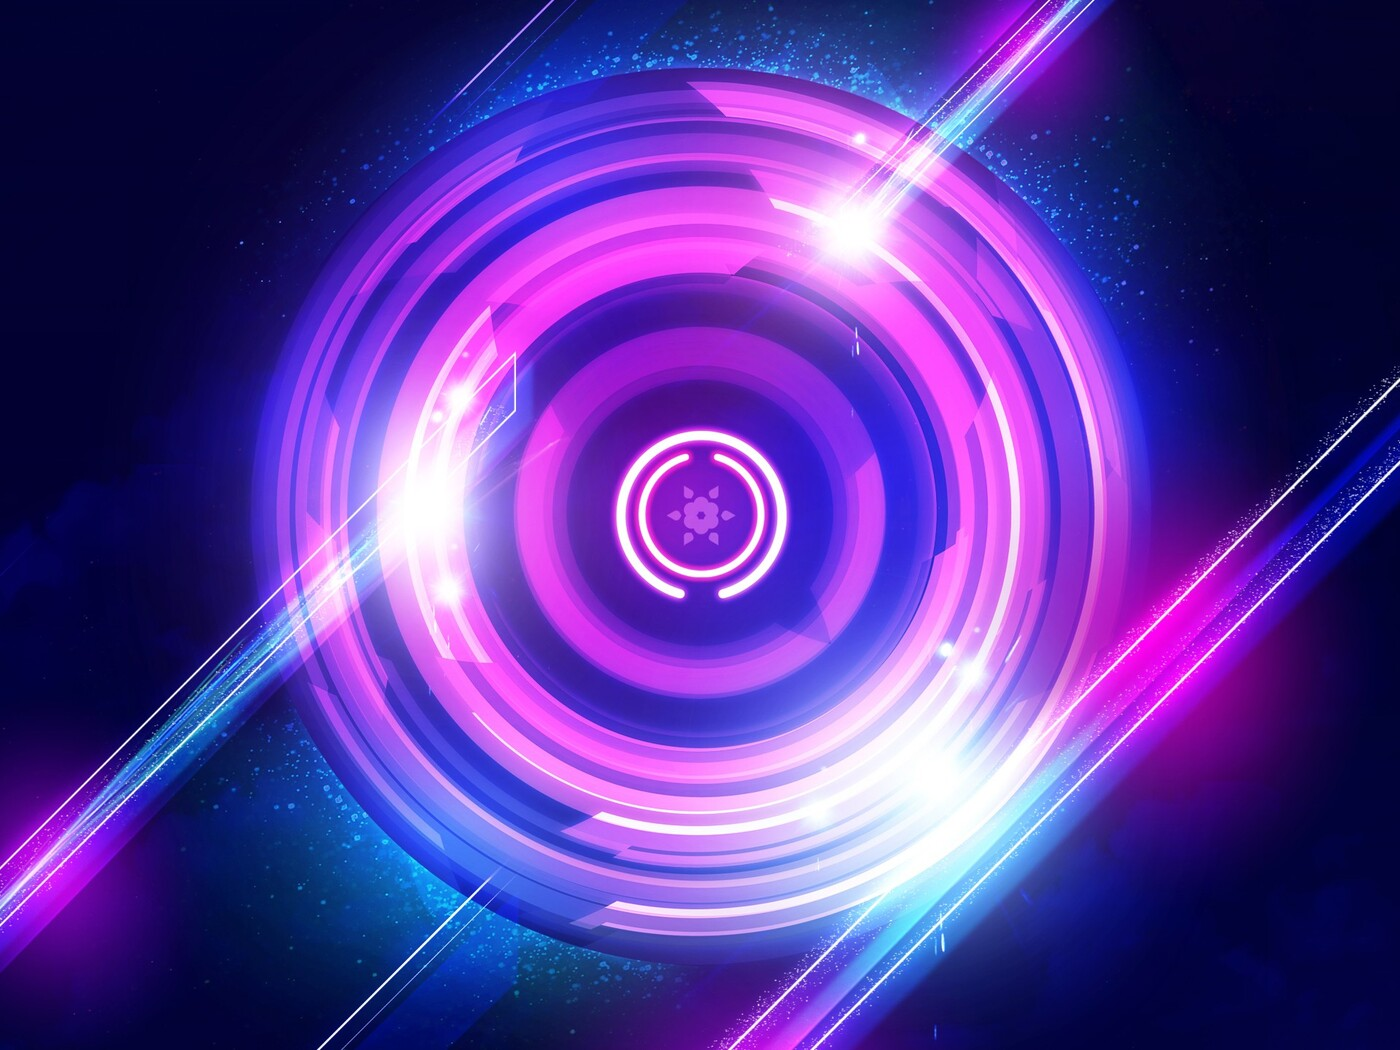 circle-digital-art-5m.jpg